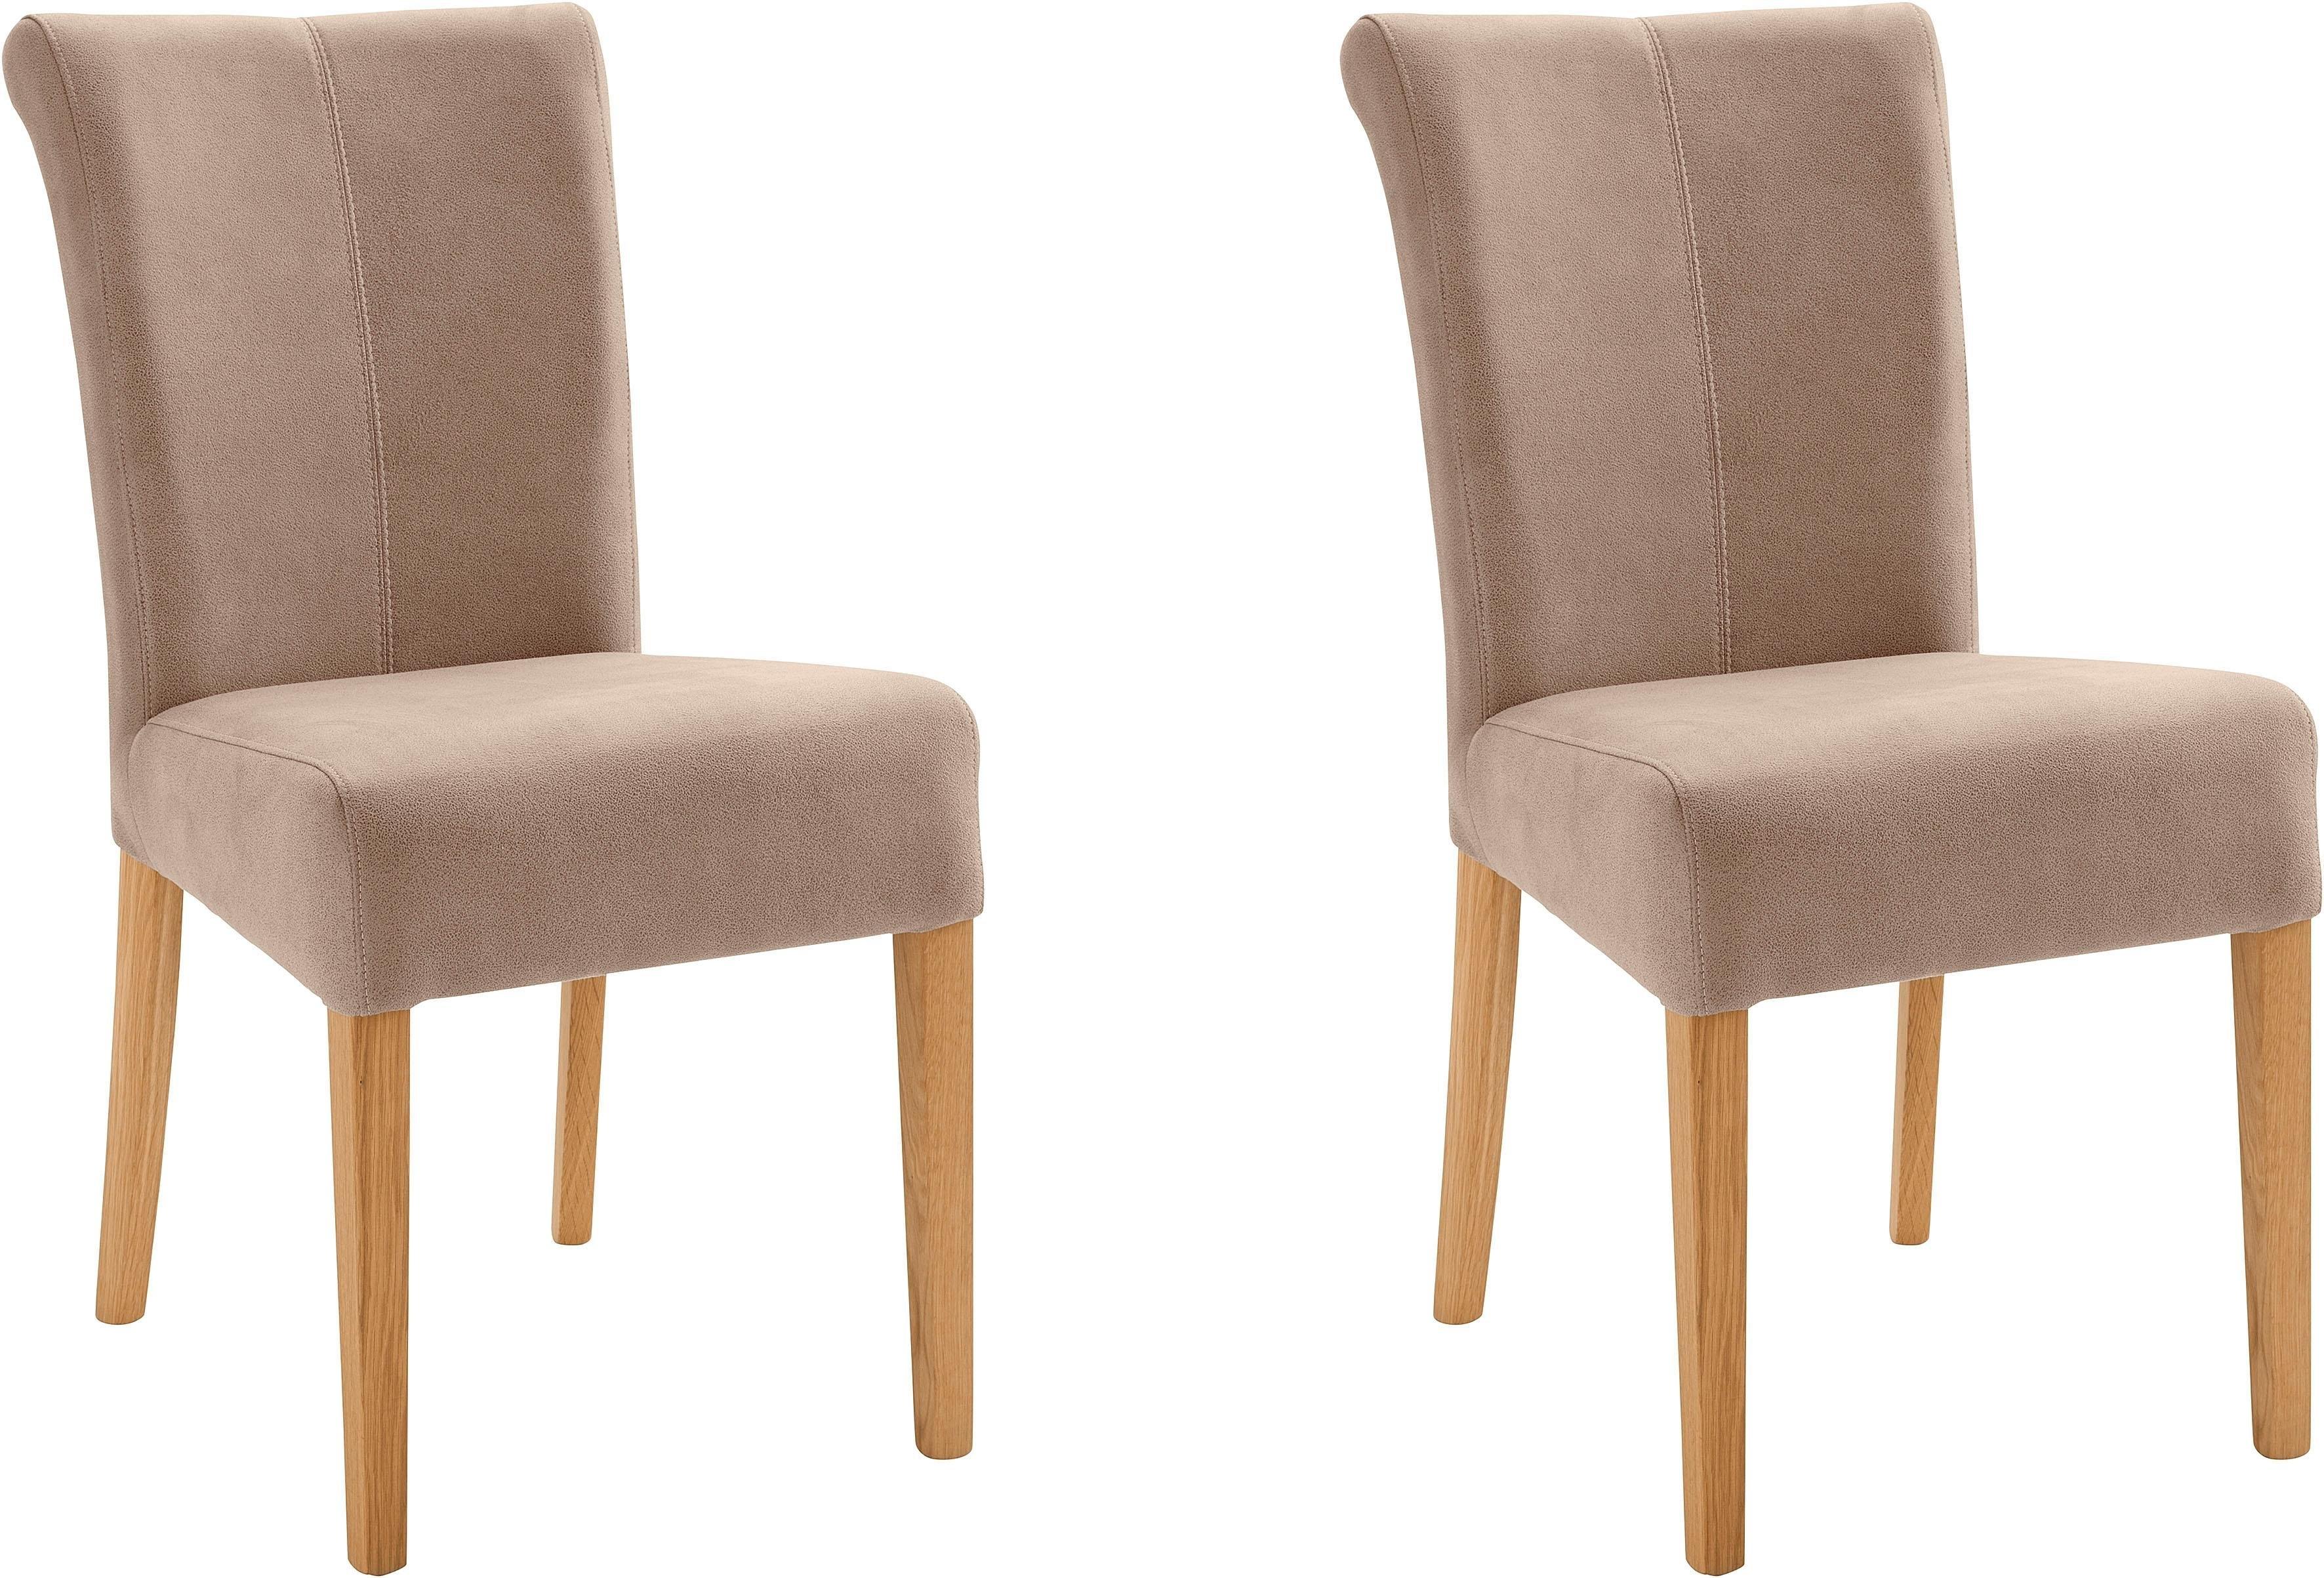 Premium collection by Home affaire stoel Barcelona (set, 2 stuks) - gratis ruilen op otto.nl